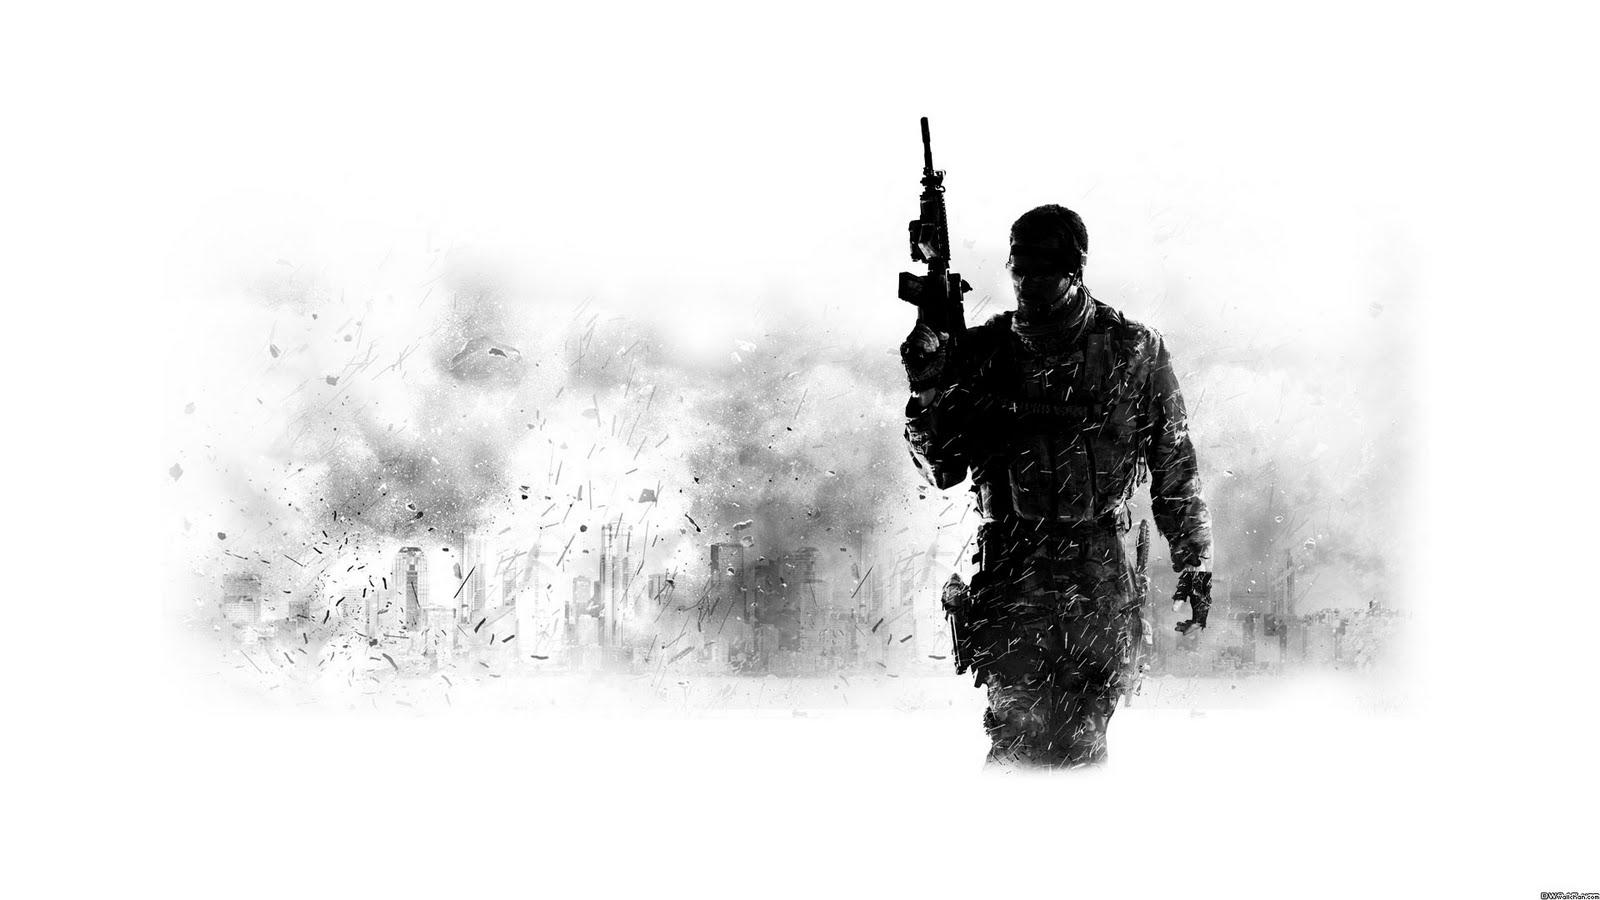 HD Resimleri   Modern Warfare 3 Wallpapers   MW3 Wallpapers 1600x900